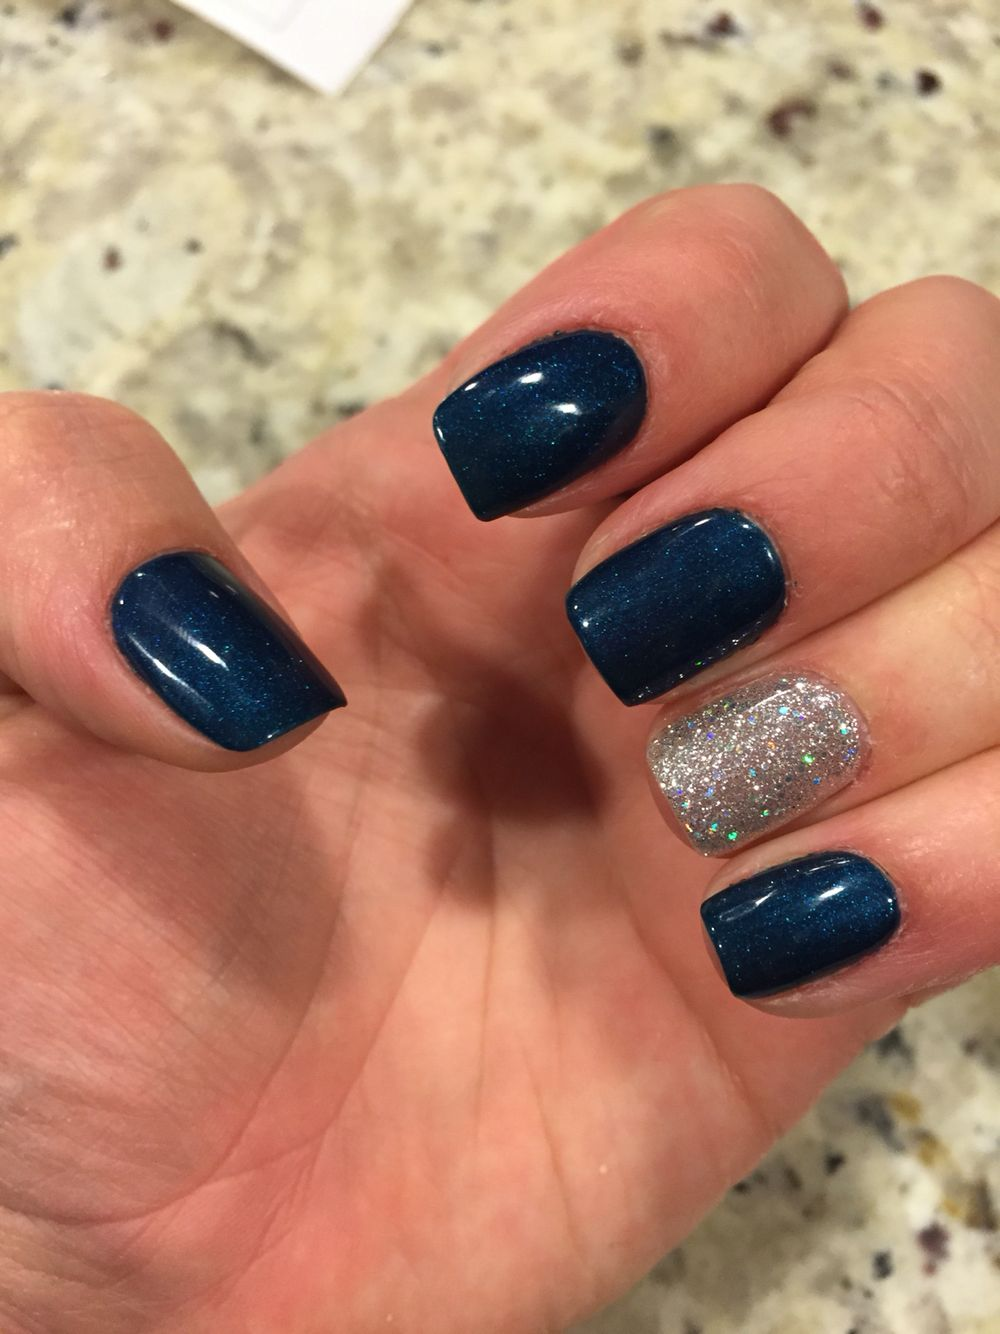 Dark blue and glitter gel nails | Nail arts | Pinterest | Glitter ...